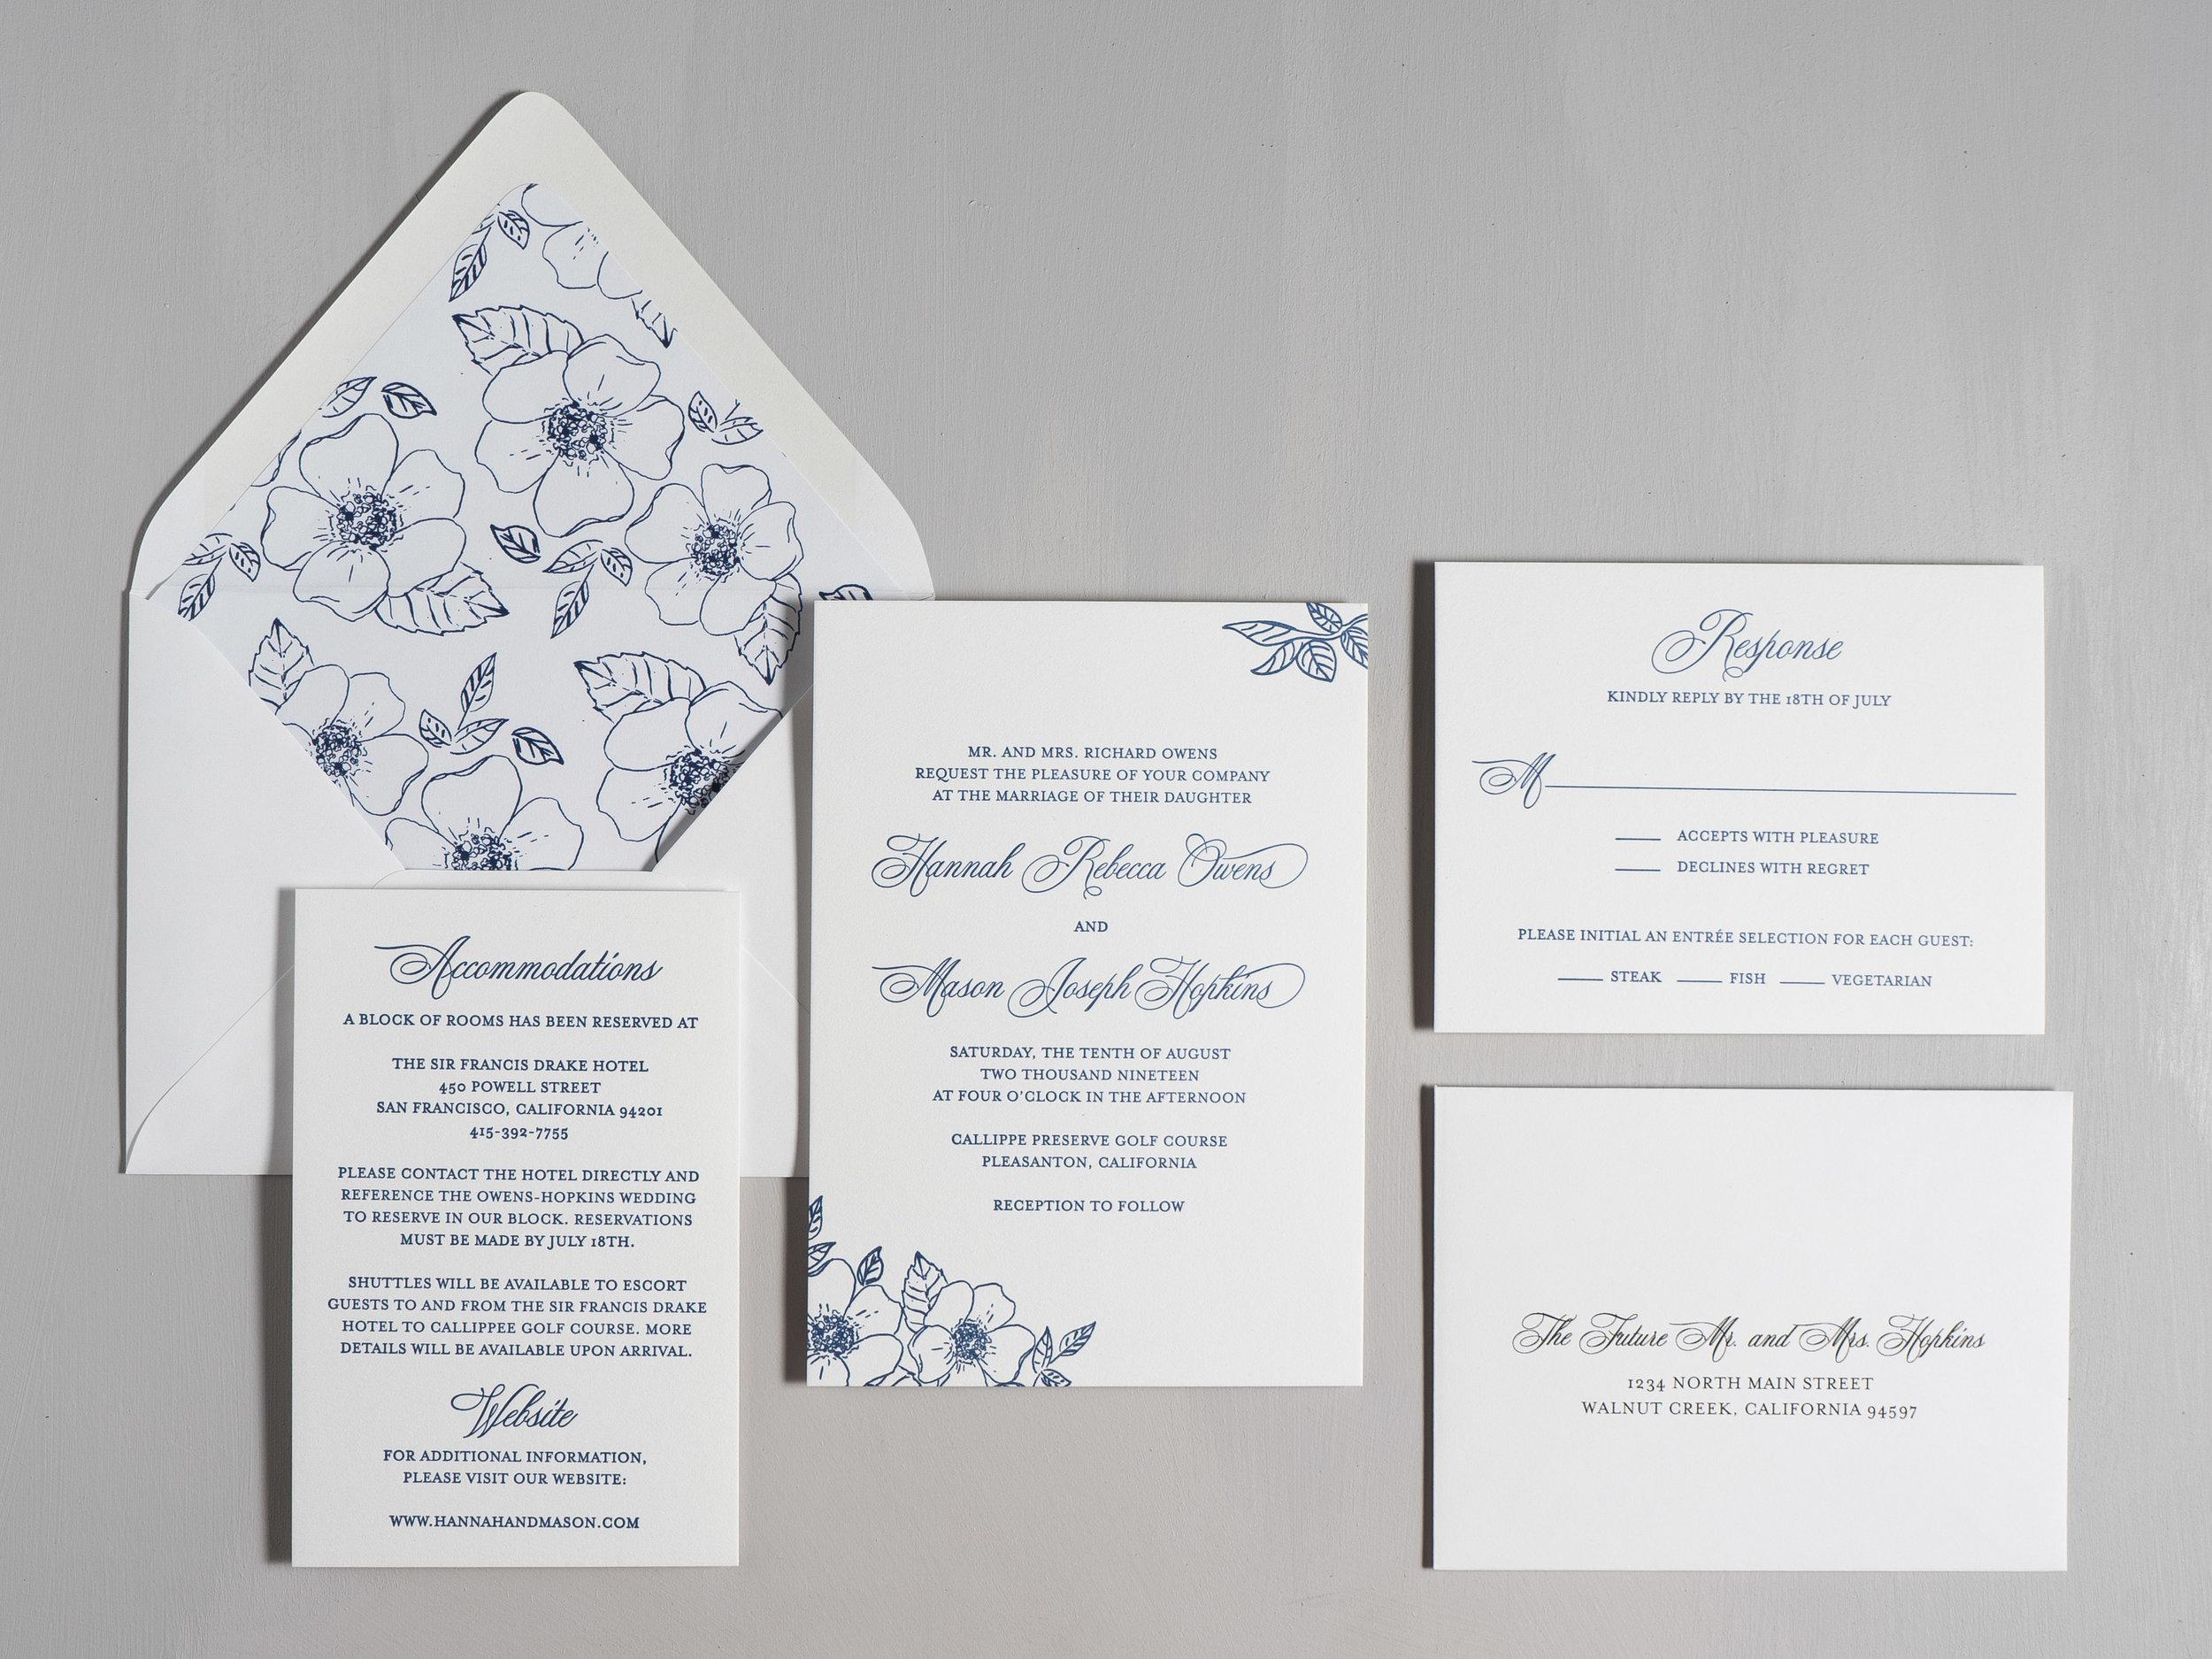 Elegant Anemone Letterpress Wedding Invitation \u2014 Just Jurf Designs